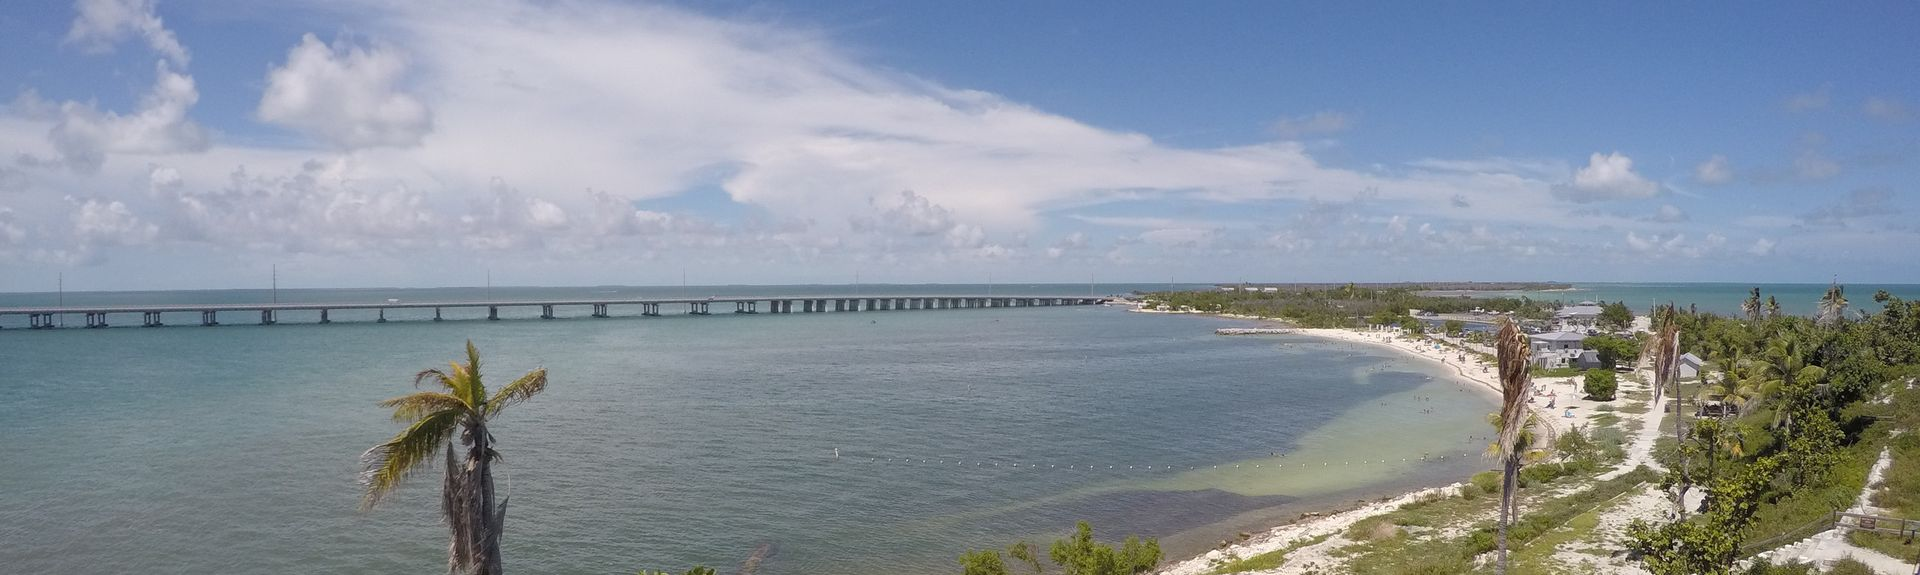 Big Torch Key, Florida, USA